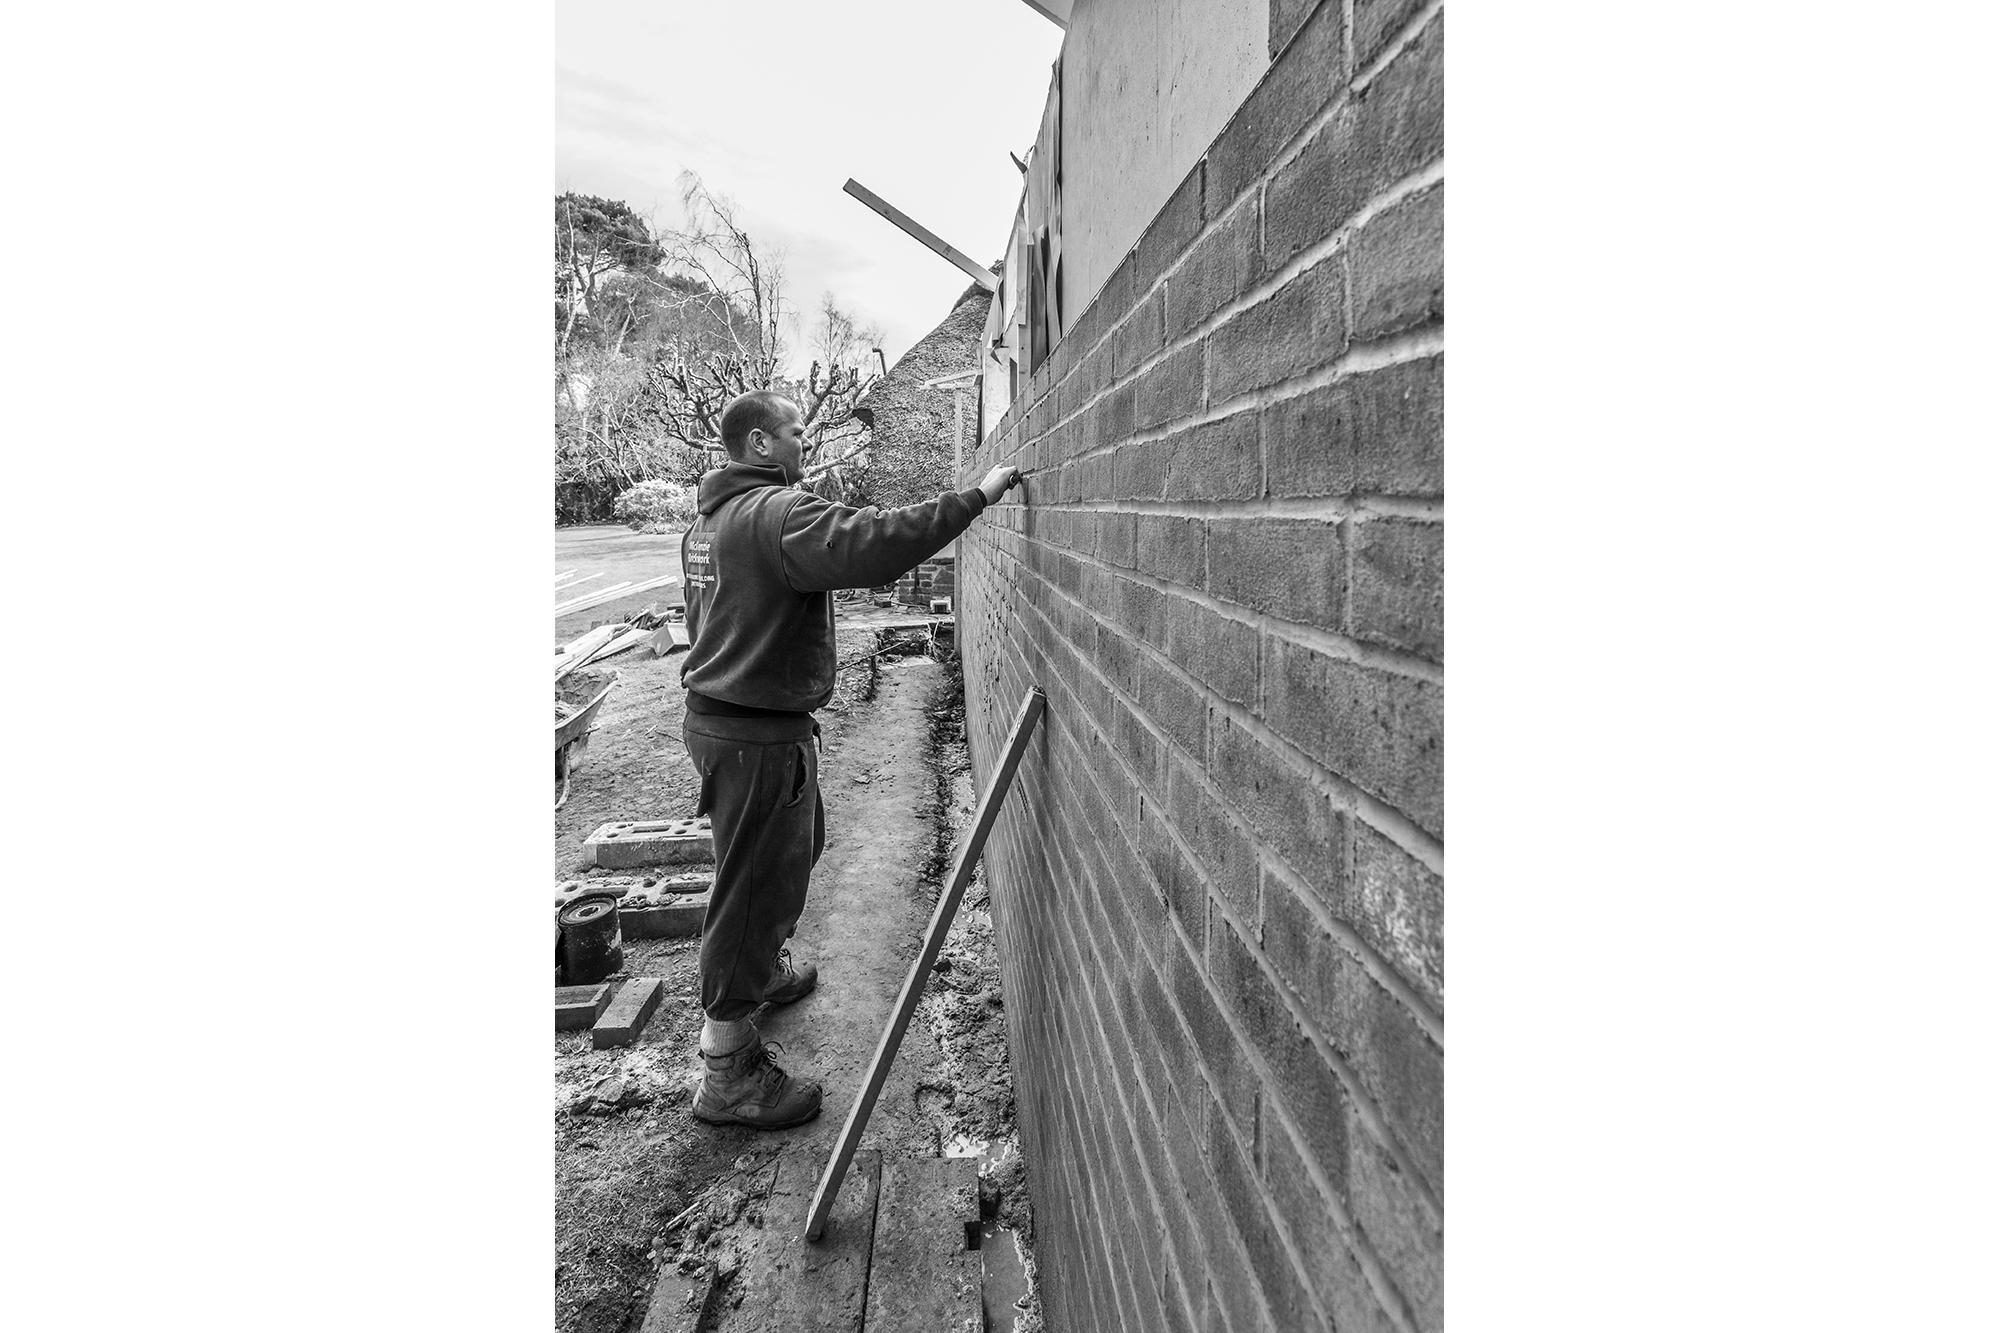 Greenshaw_Construction_13.jpg